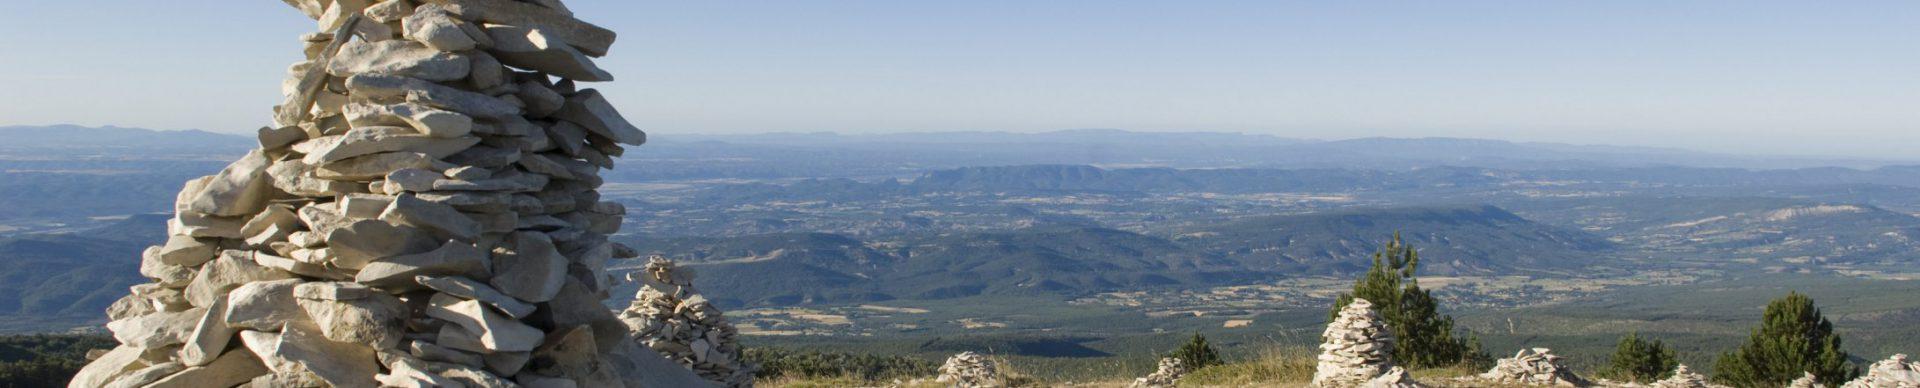 Montagne de Lure ©M. Boutin